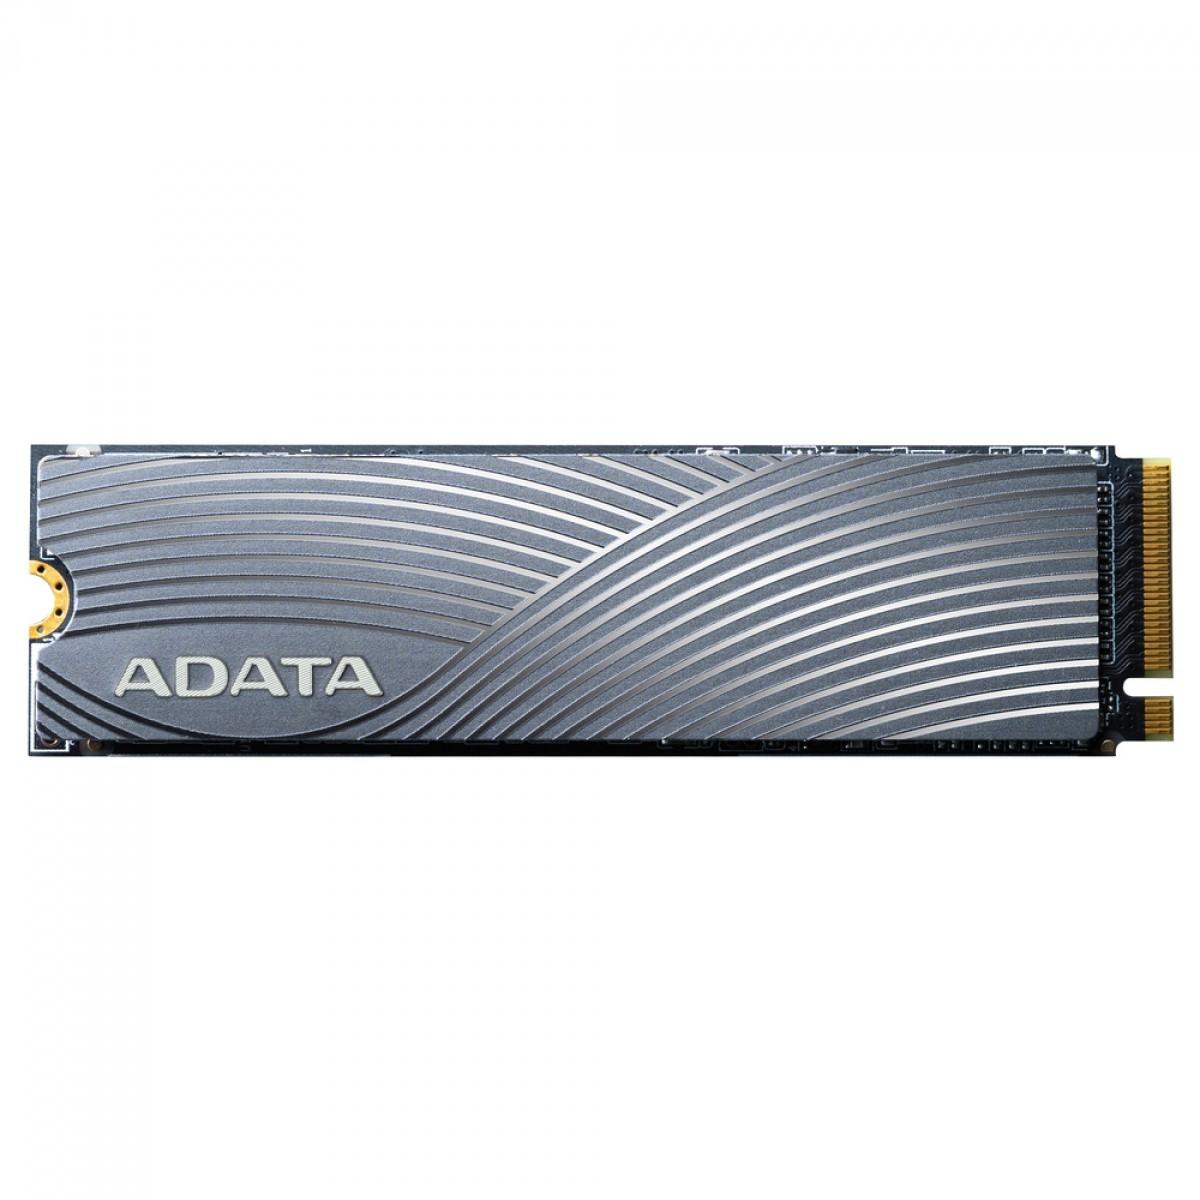 SSD Adata Swordfish 2TB, M.2 2280, Leitura 1800MBs e Gravação 1200MBs, ASWORDFISH-2T-C